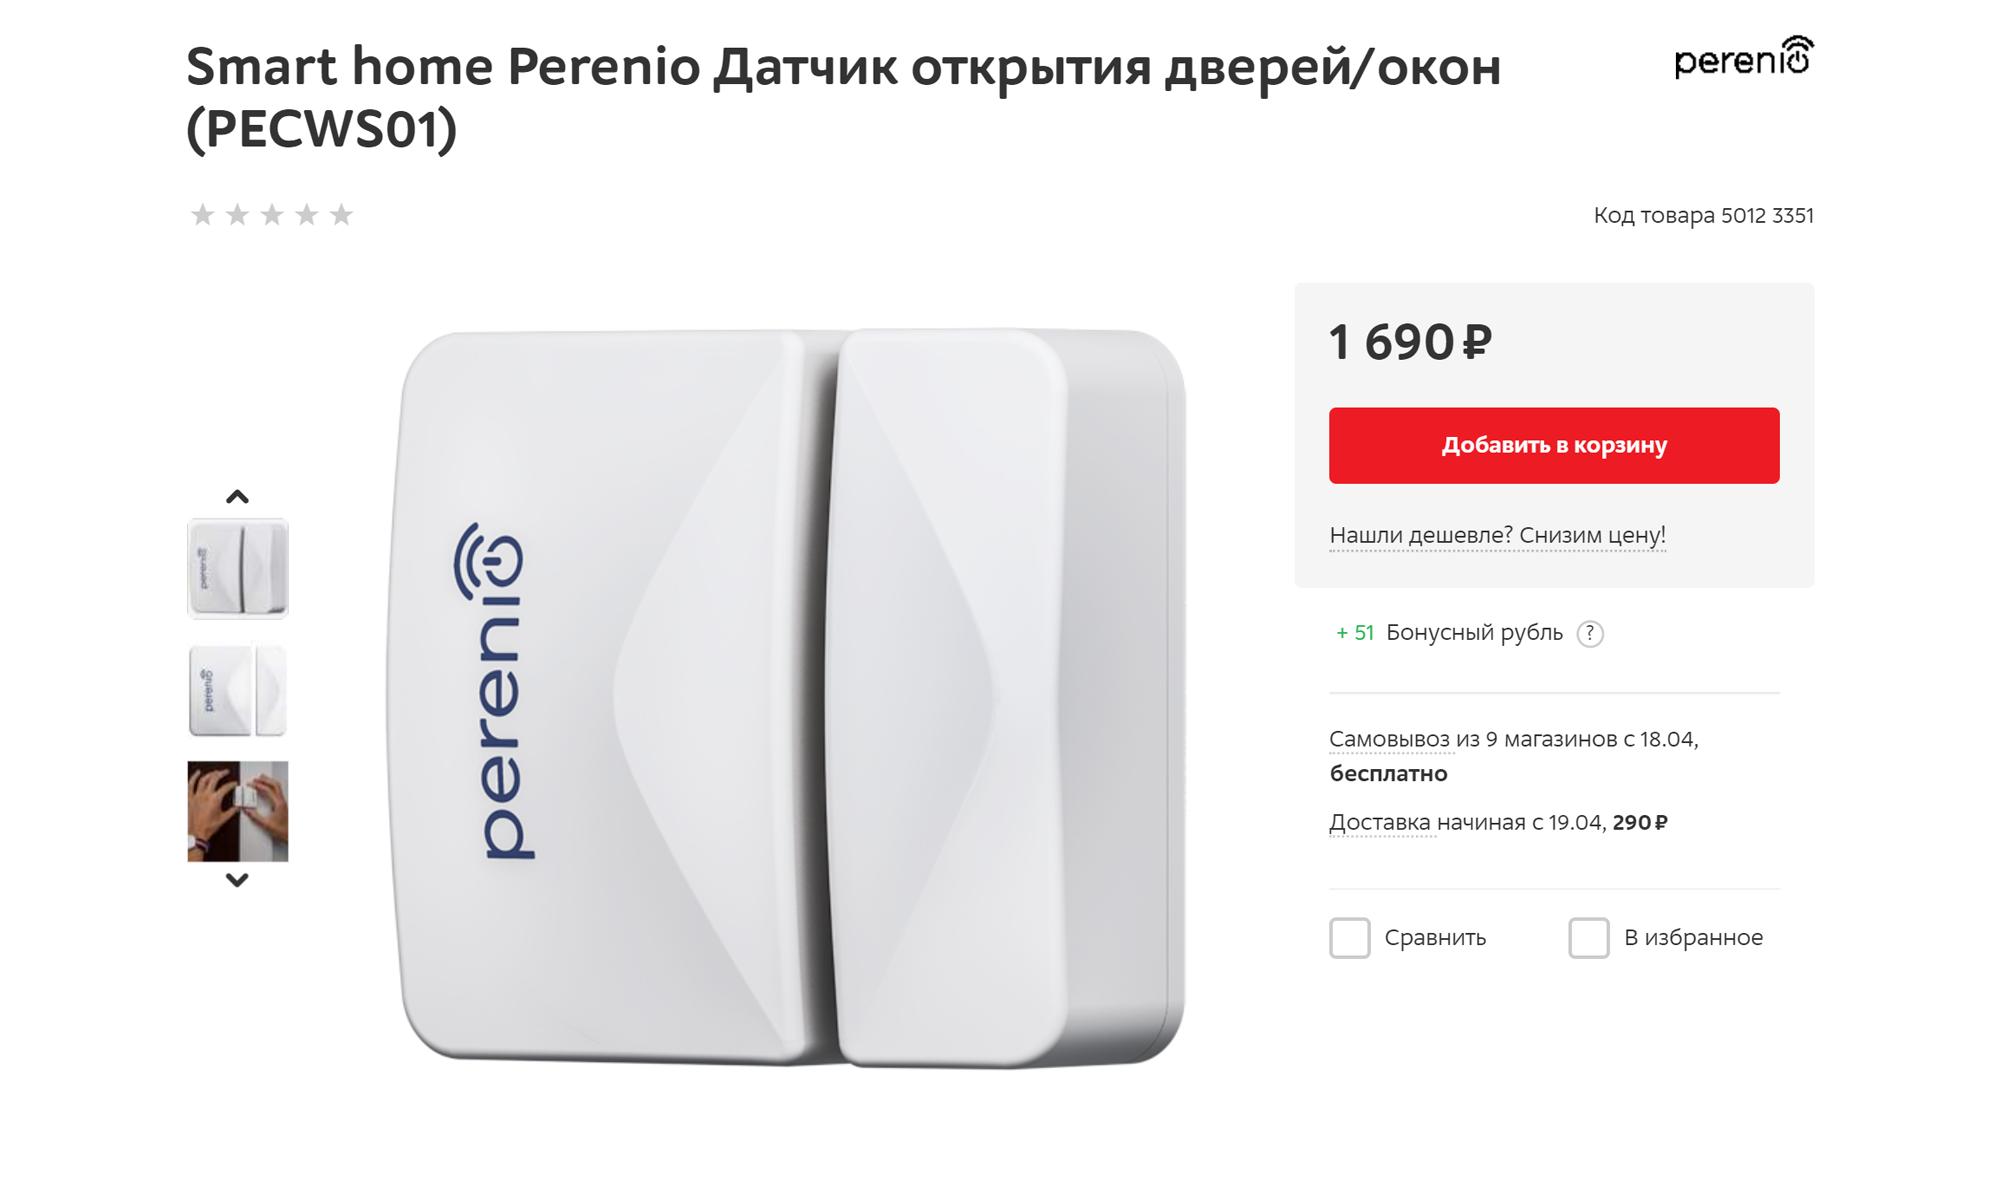 Датчик открытия дверей и окон Smart home за 1690<span class=ruble>Р</span>